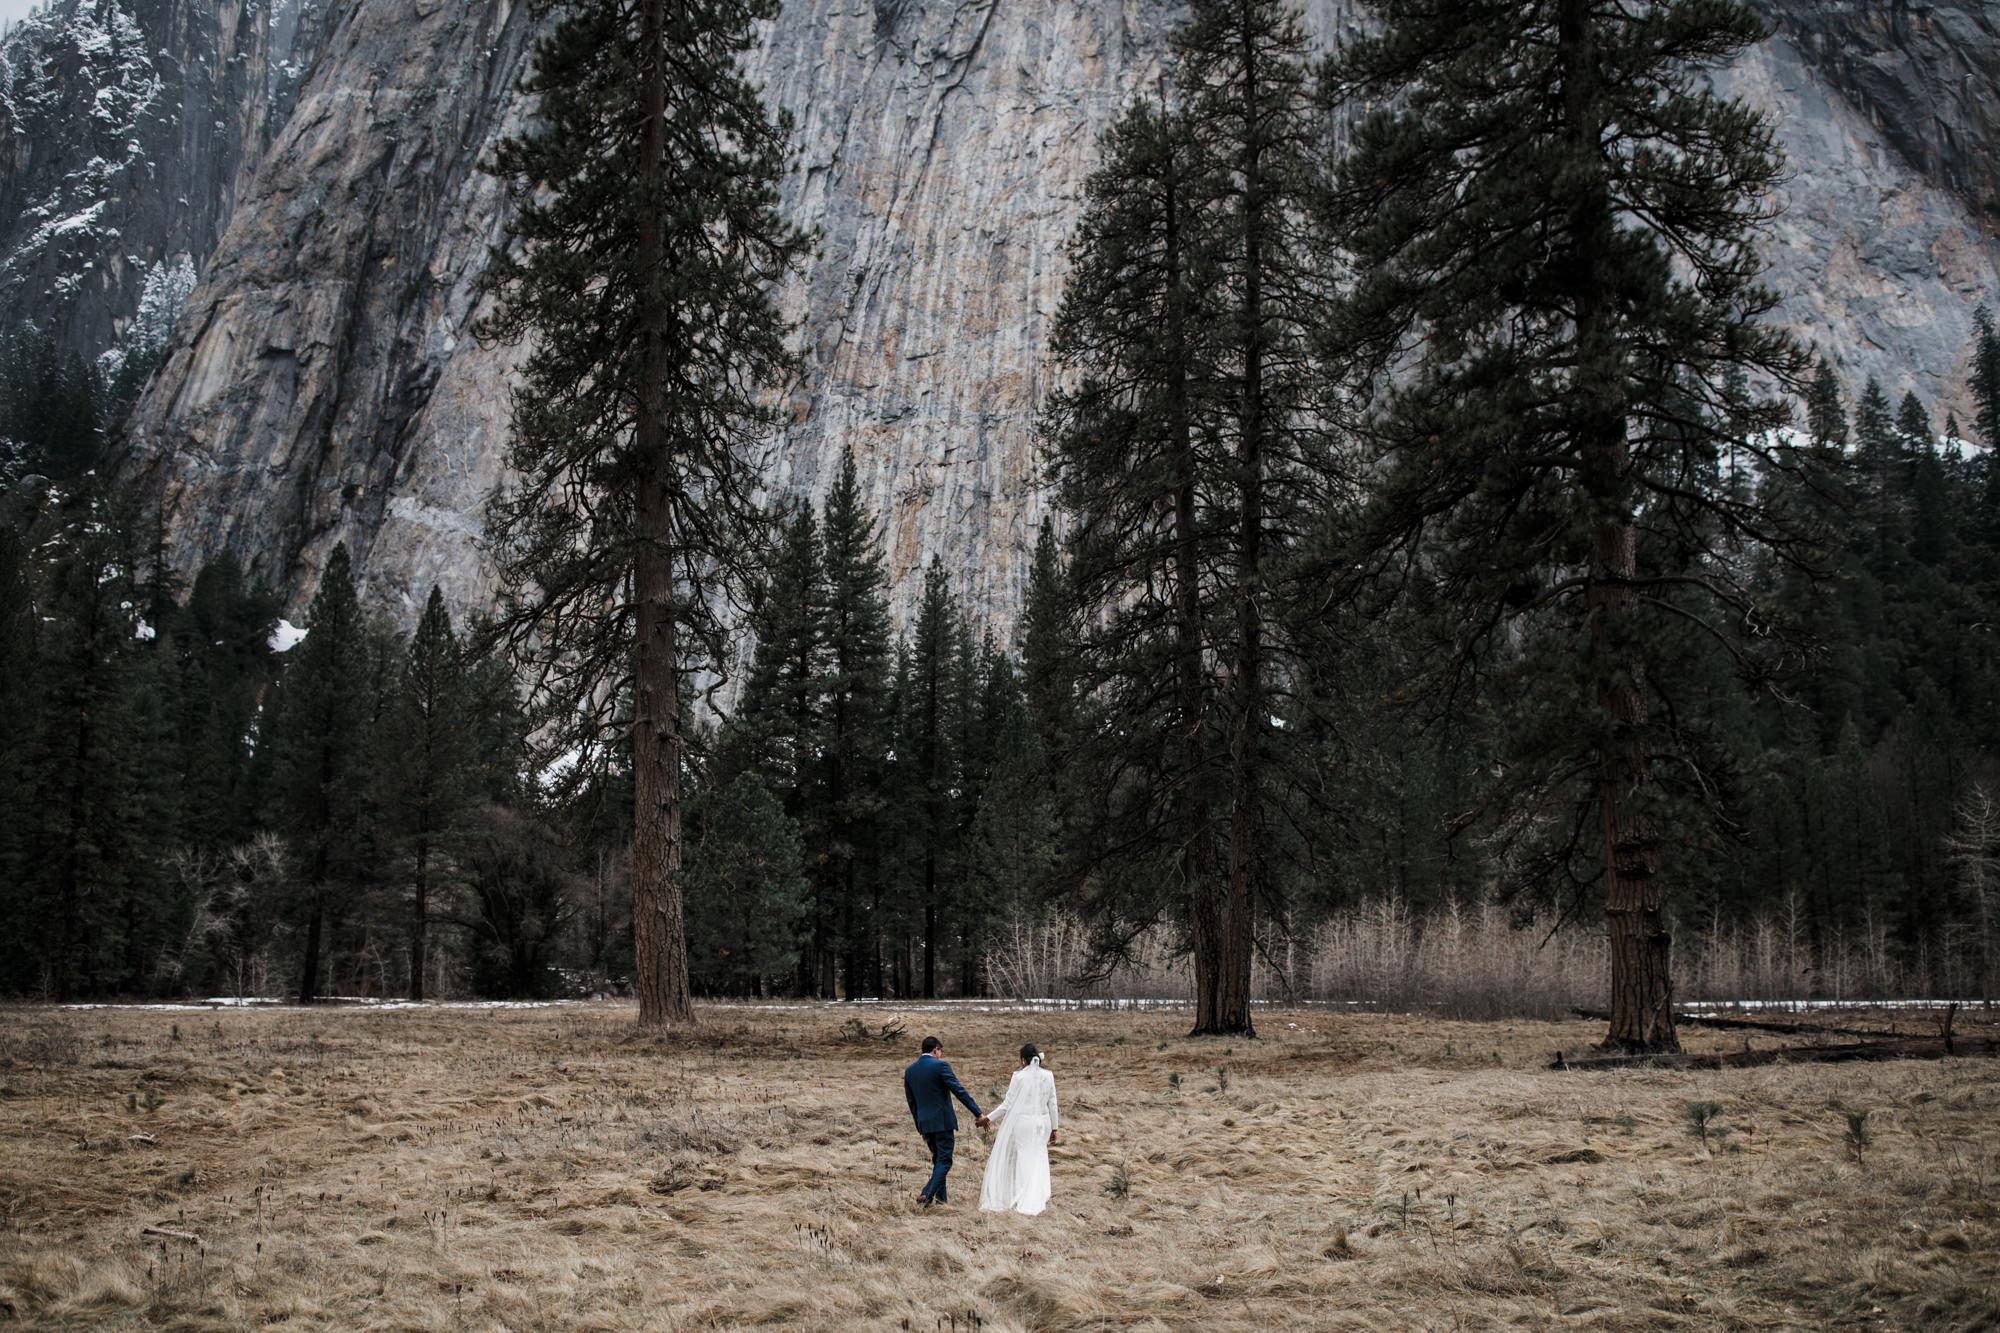 elopement photographer in yosemite national park